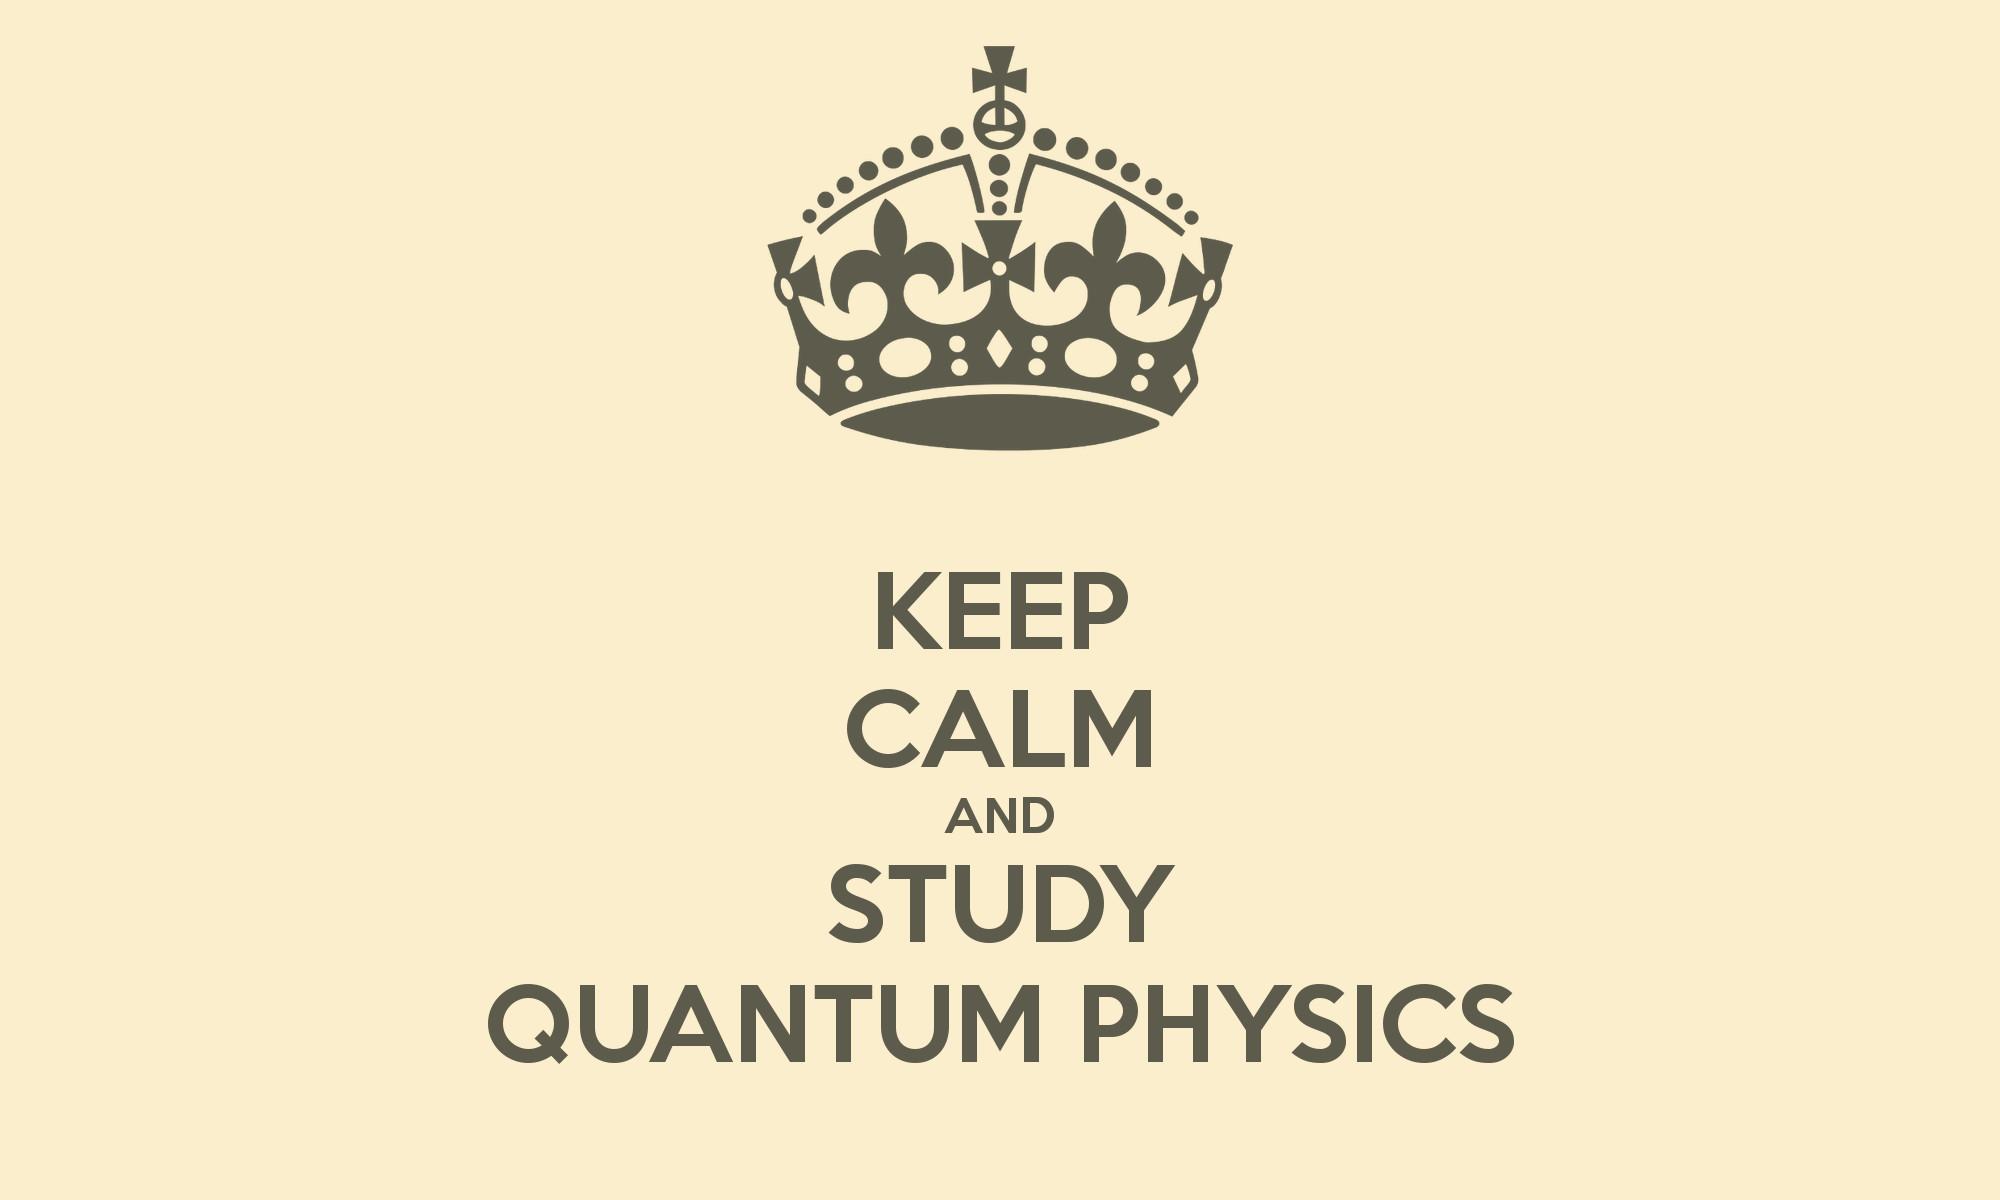 AND STUDY QUANTUM PHYSICS Quantum Physics Wallpaper